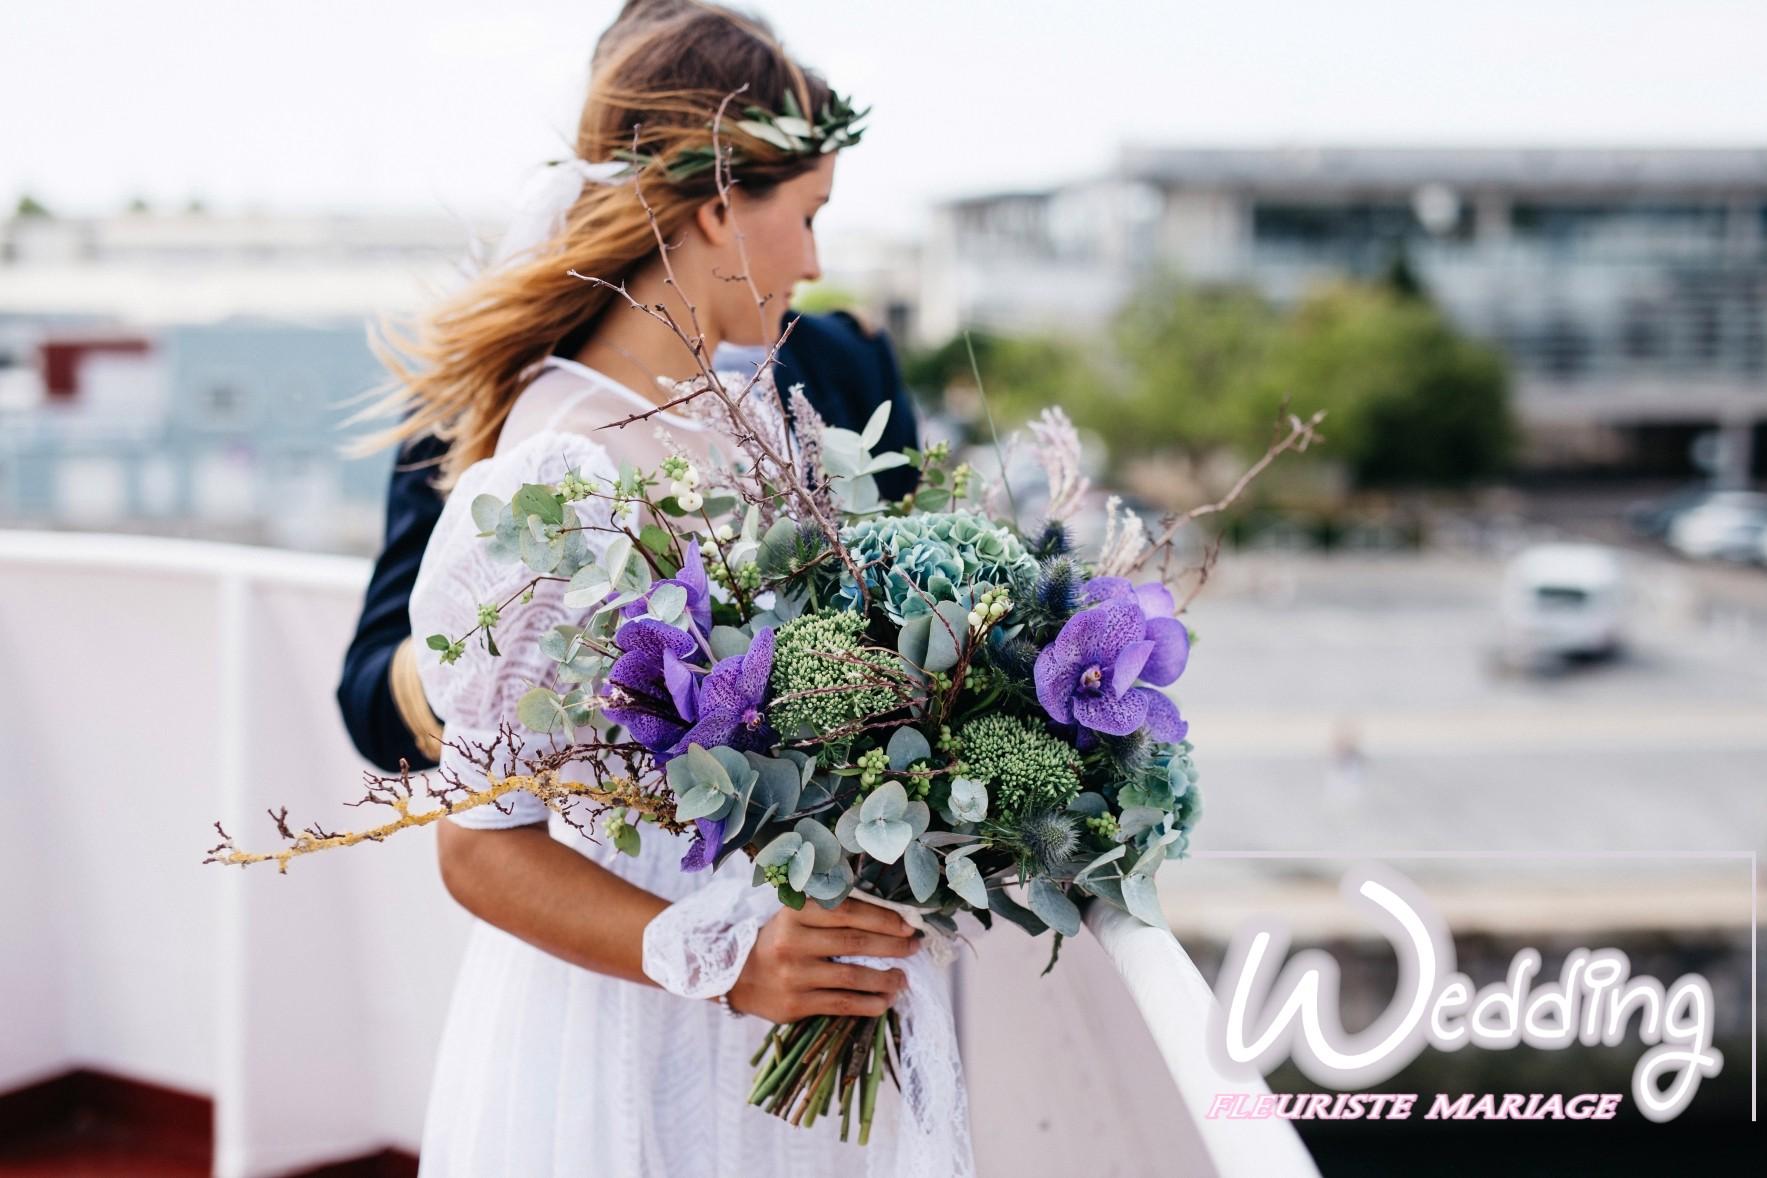 BOUQUETS DE MARIÉE MANDELIEU- WEDDING FLEURISTE MARIAGE MANDELIEU